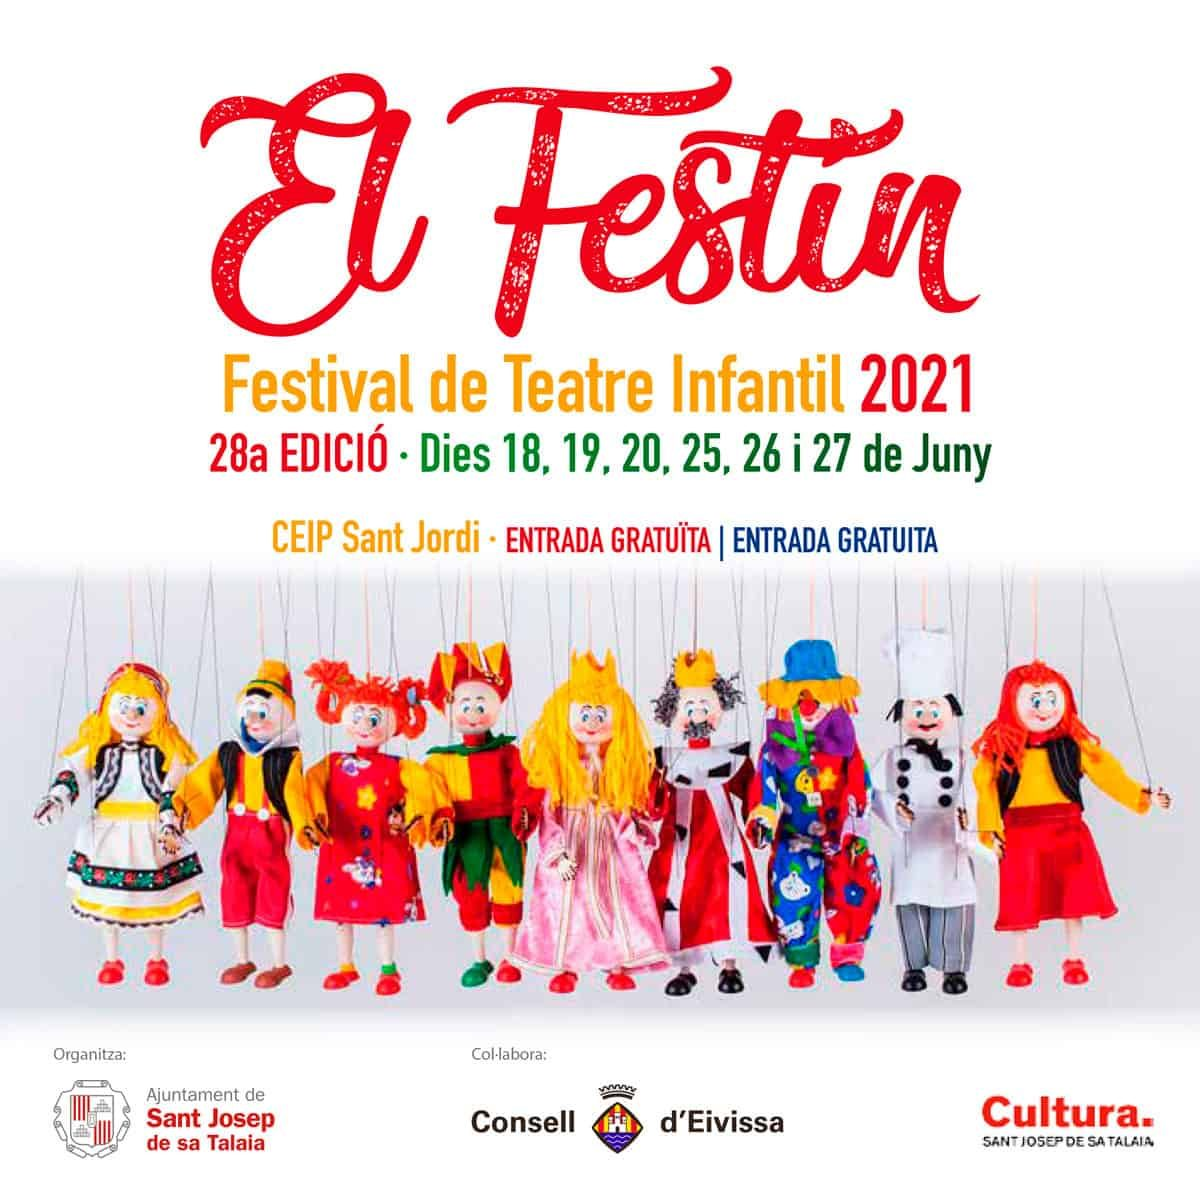 el-festin-festival-de-teatre-infantil-2021-Eivissa-sant-jordi-welcometoibiza